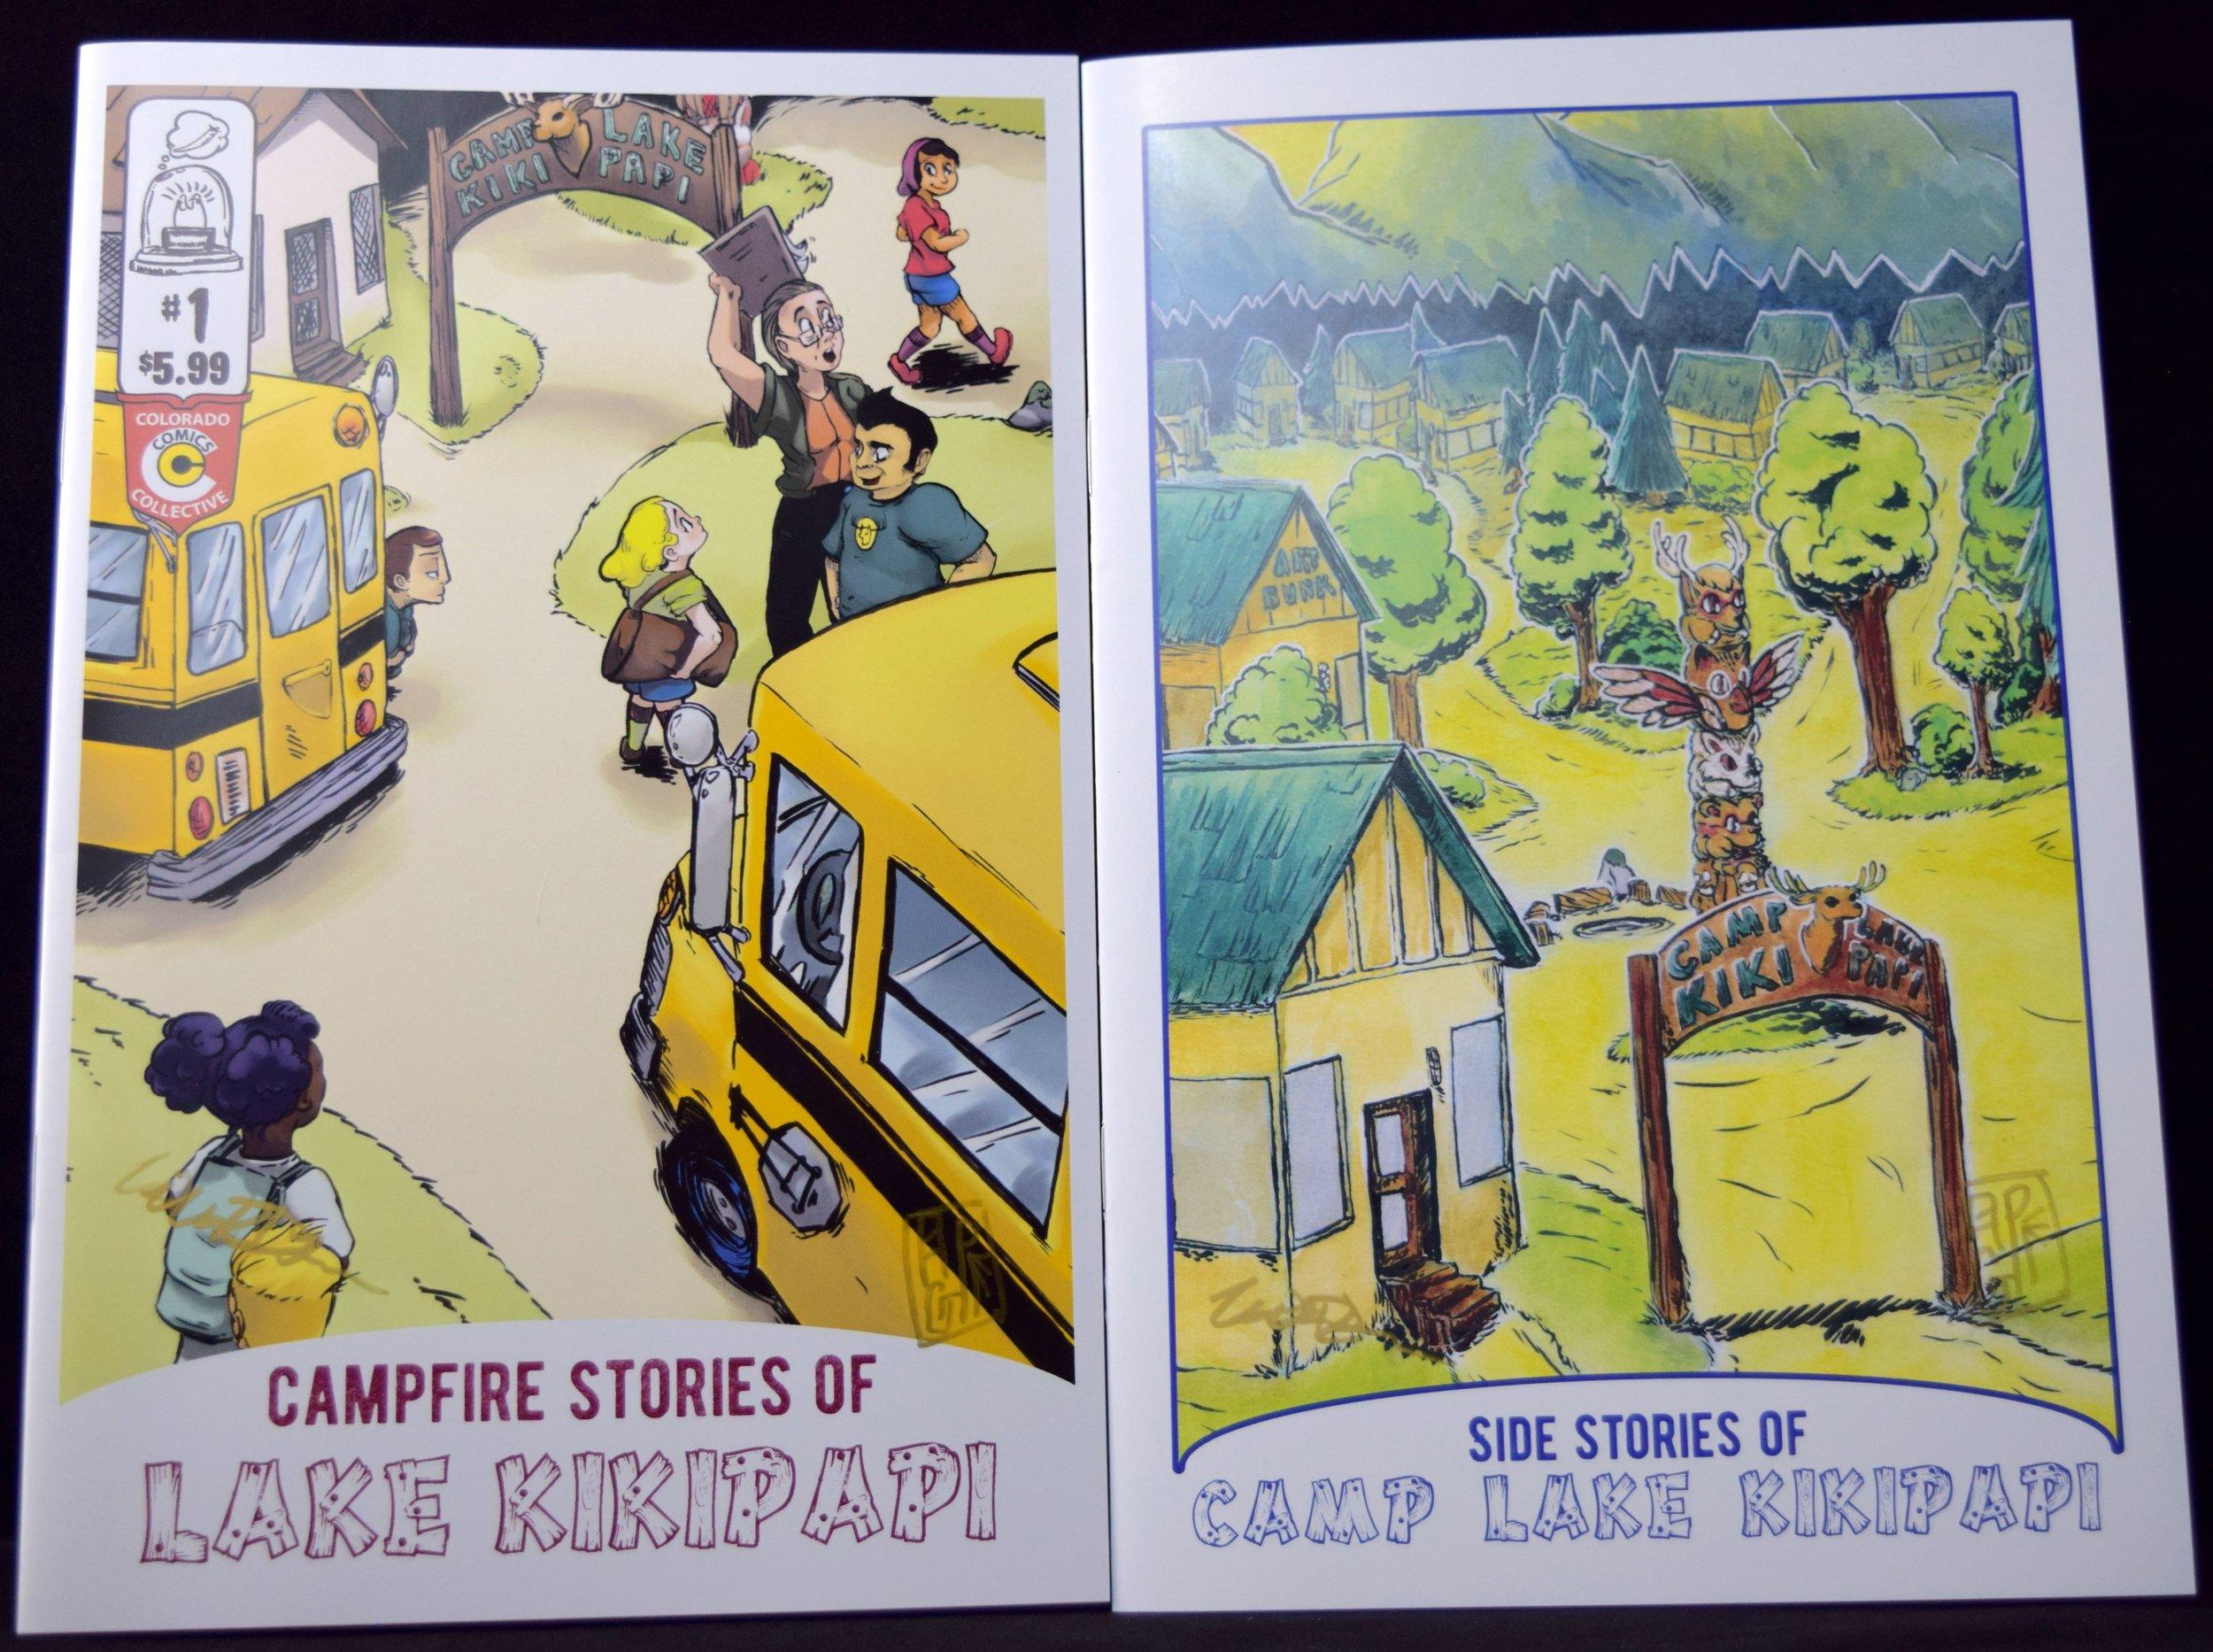 Campfire Stories of Lake Kikipapi    #1  & the new issue   Side Stories of Camp Lake Kikipapi  from Bill & Pepper DeLuca.